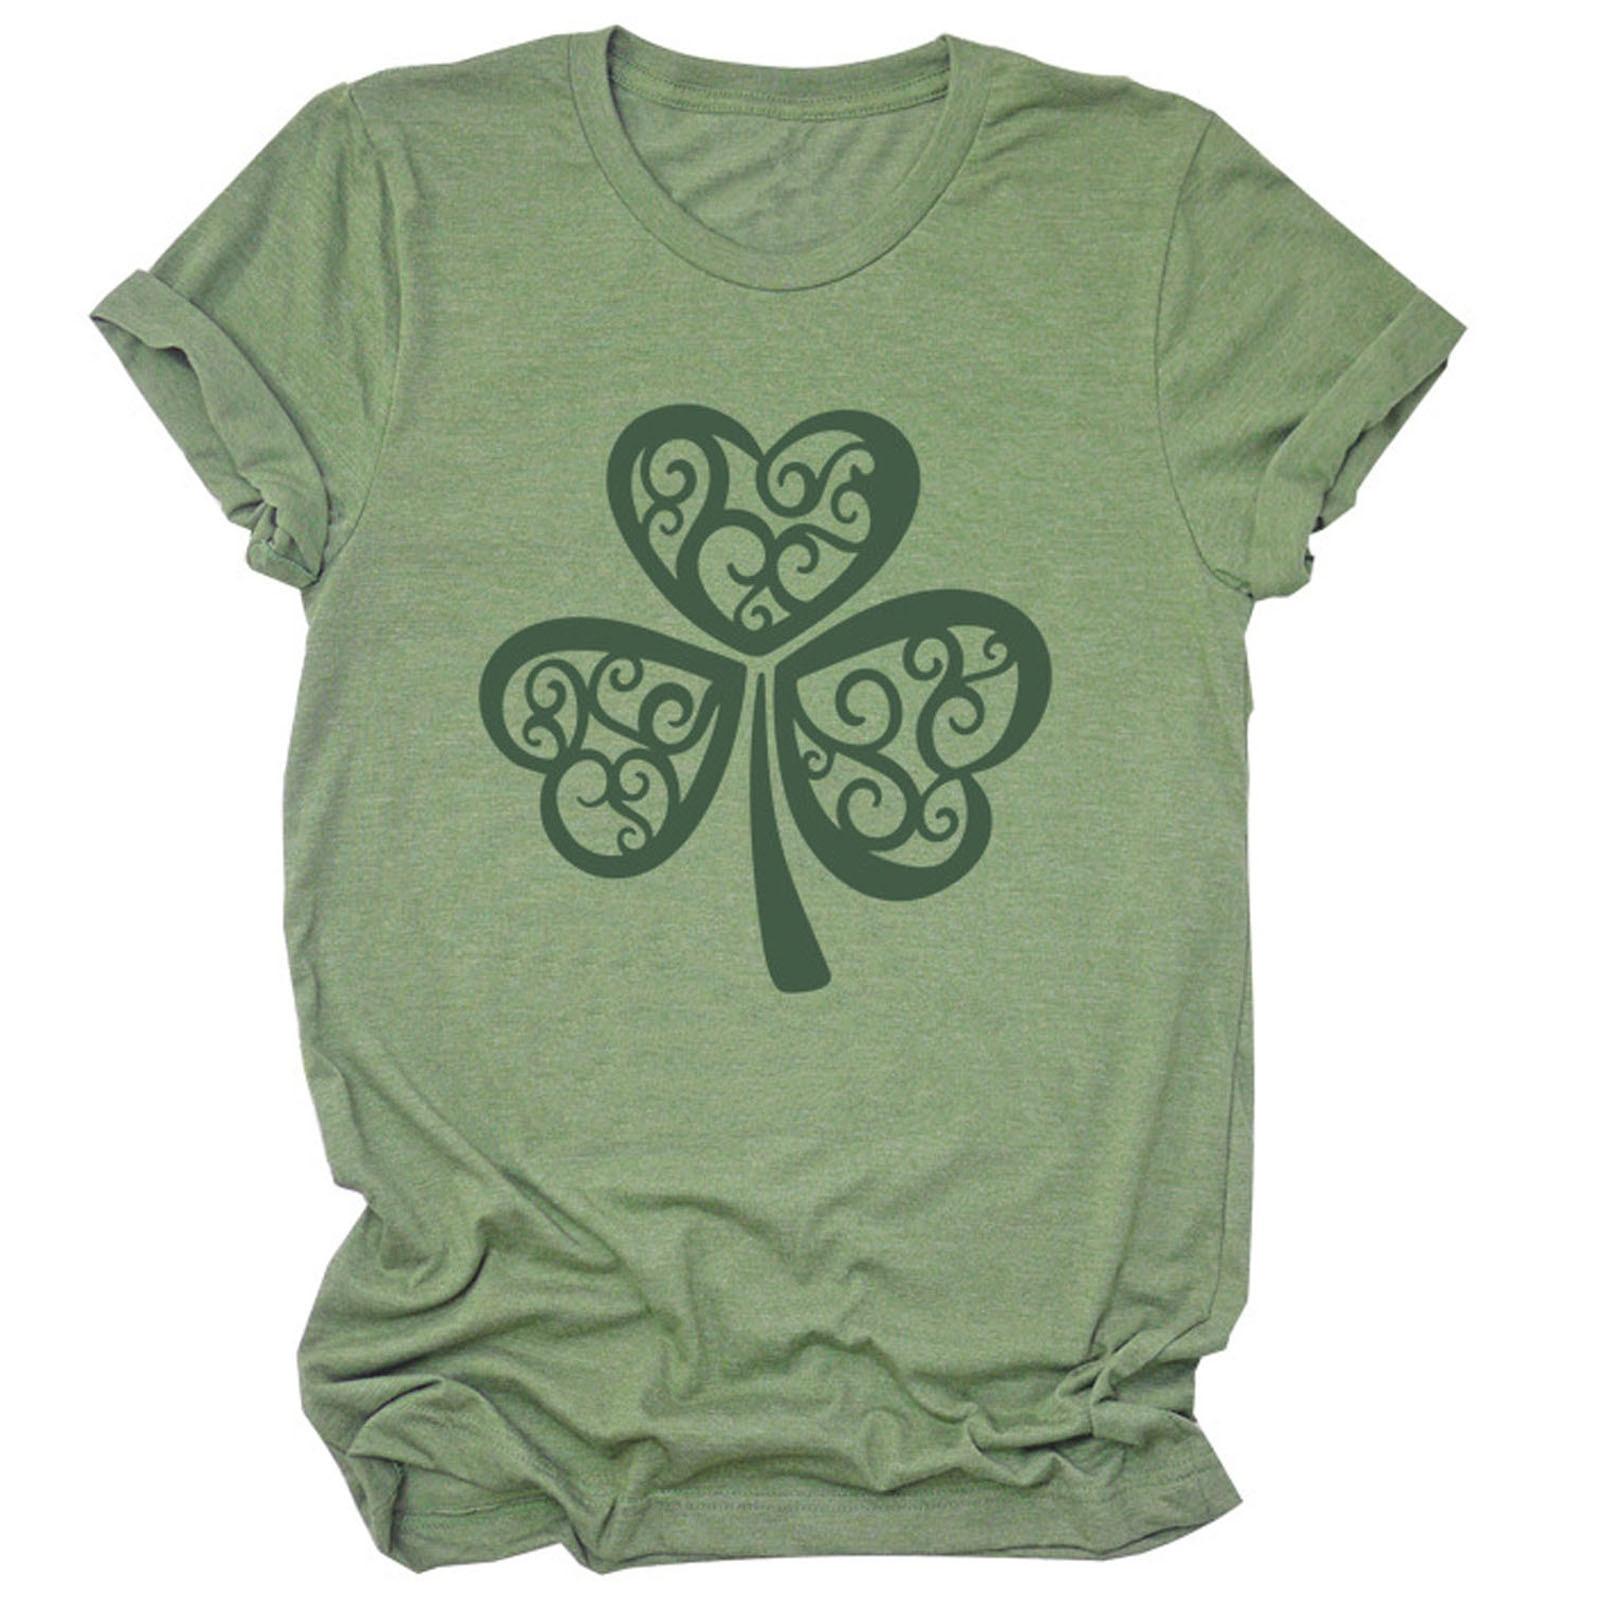 Groen Blad Planten Gedrukt T-shirt Vrouwen St. Patricks Day T Shirt Korte Mouw O Neck Holiday Casual Tee Tops Camisetas de Mujer